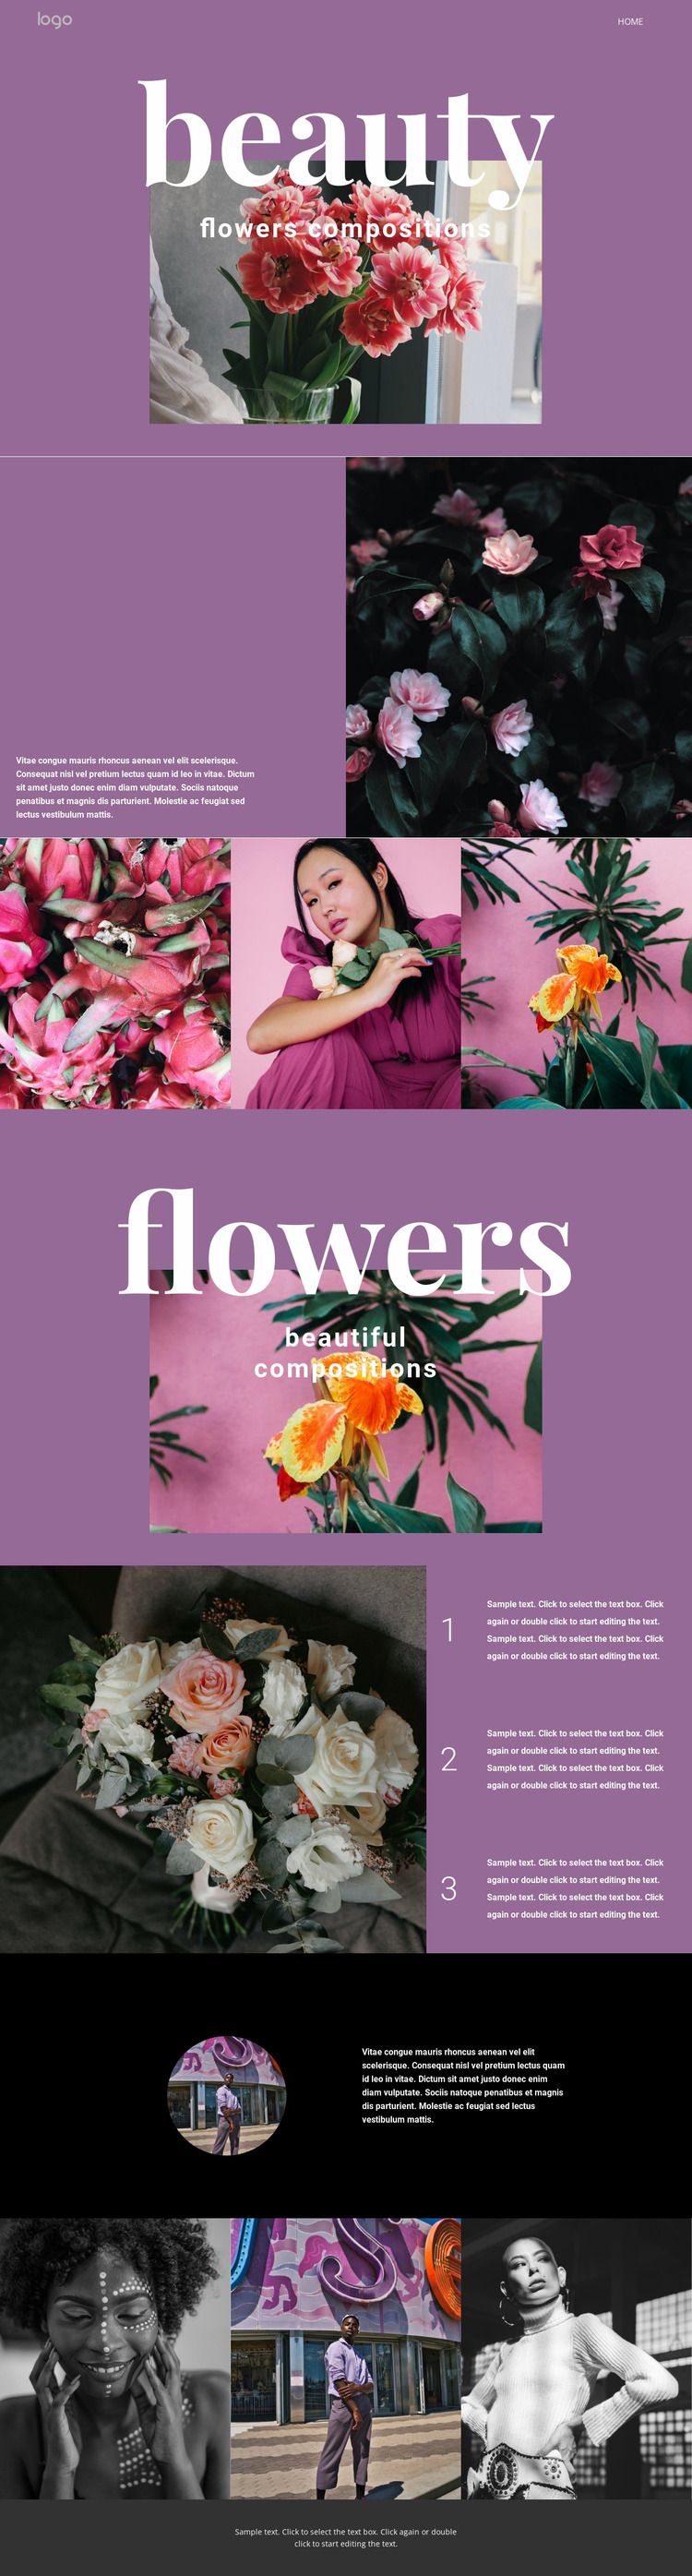 Flower salon Html Website Builder